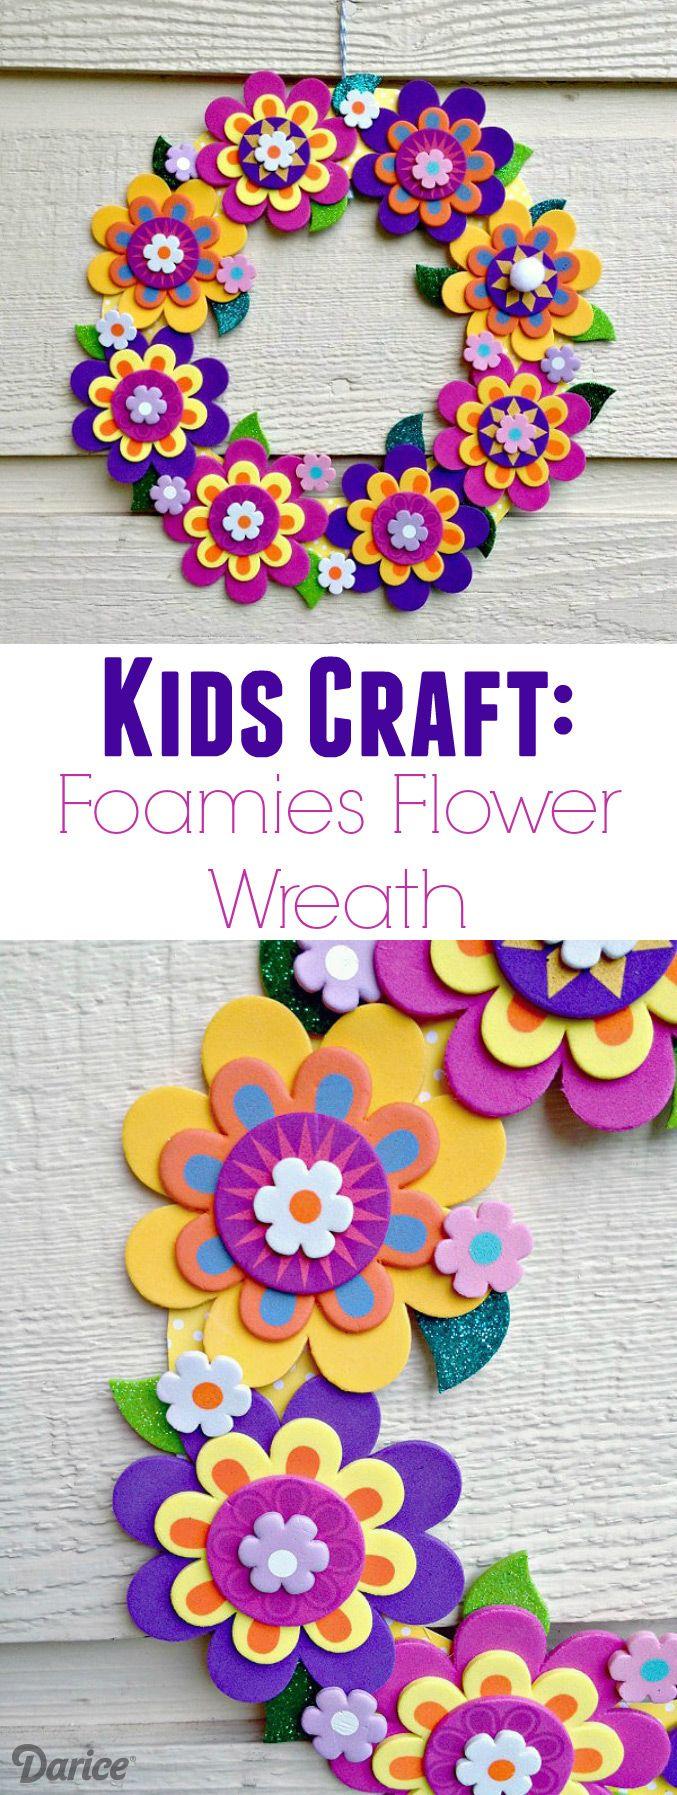 Kids Craft Idea: Foamies Flower Wreath - Darice